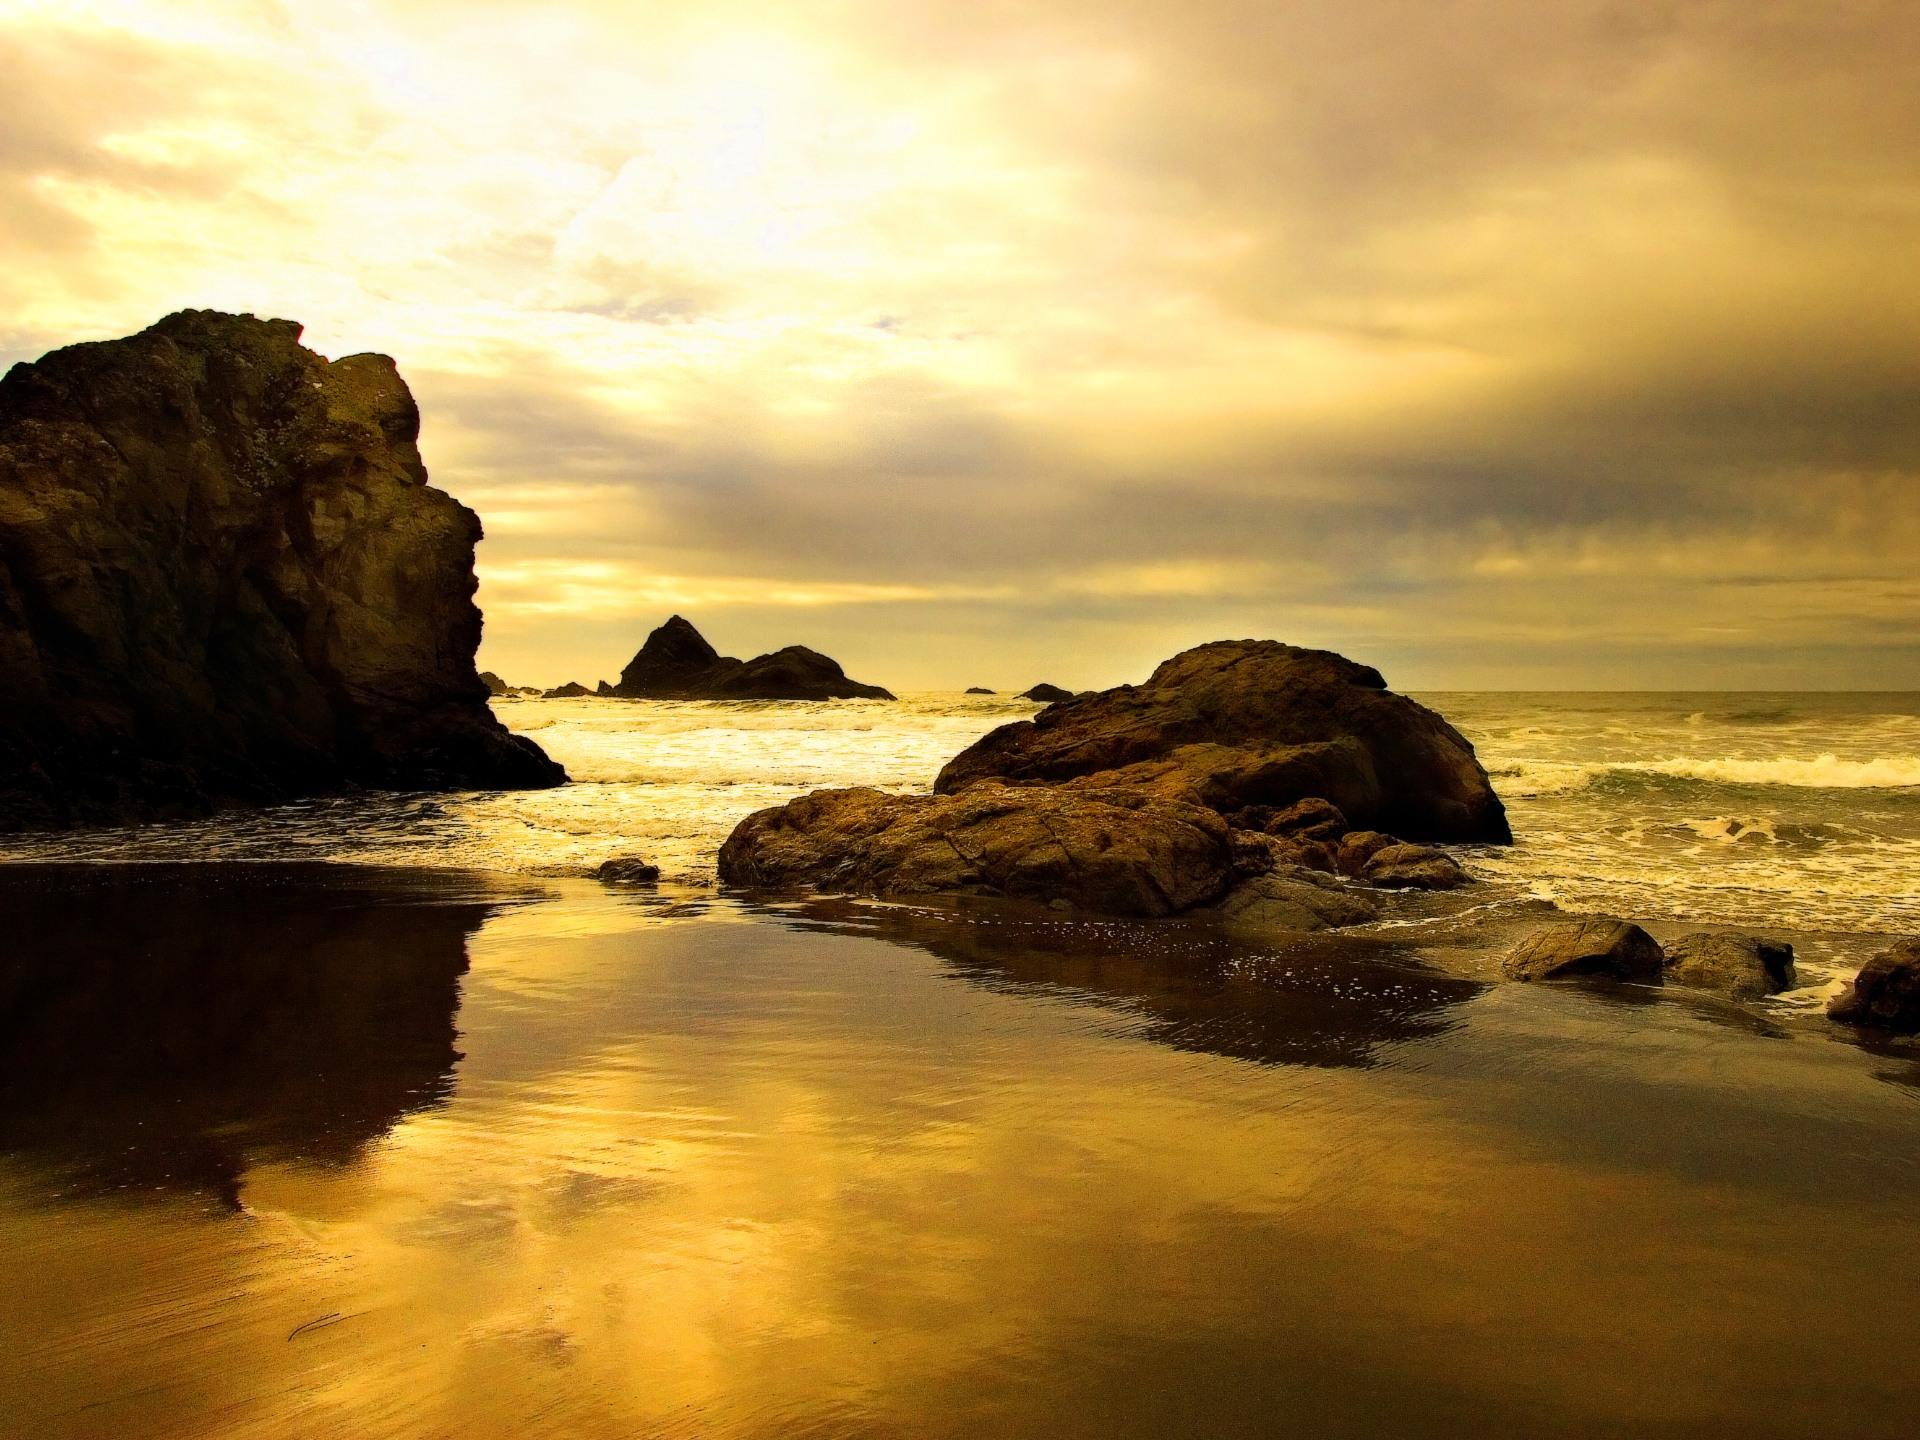 Ocean's Surface Reflection desktop wallpaper